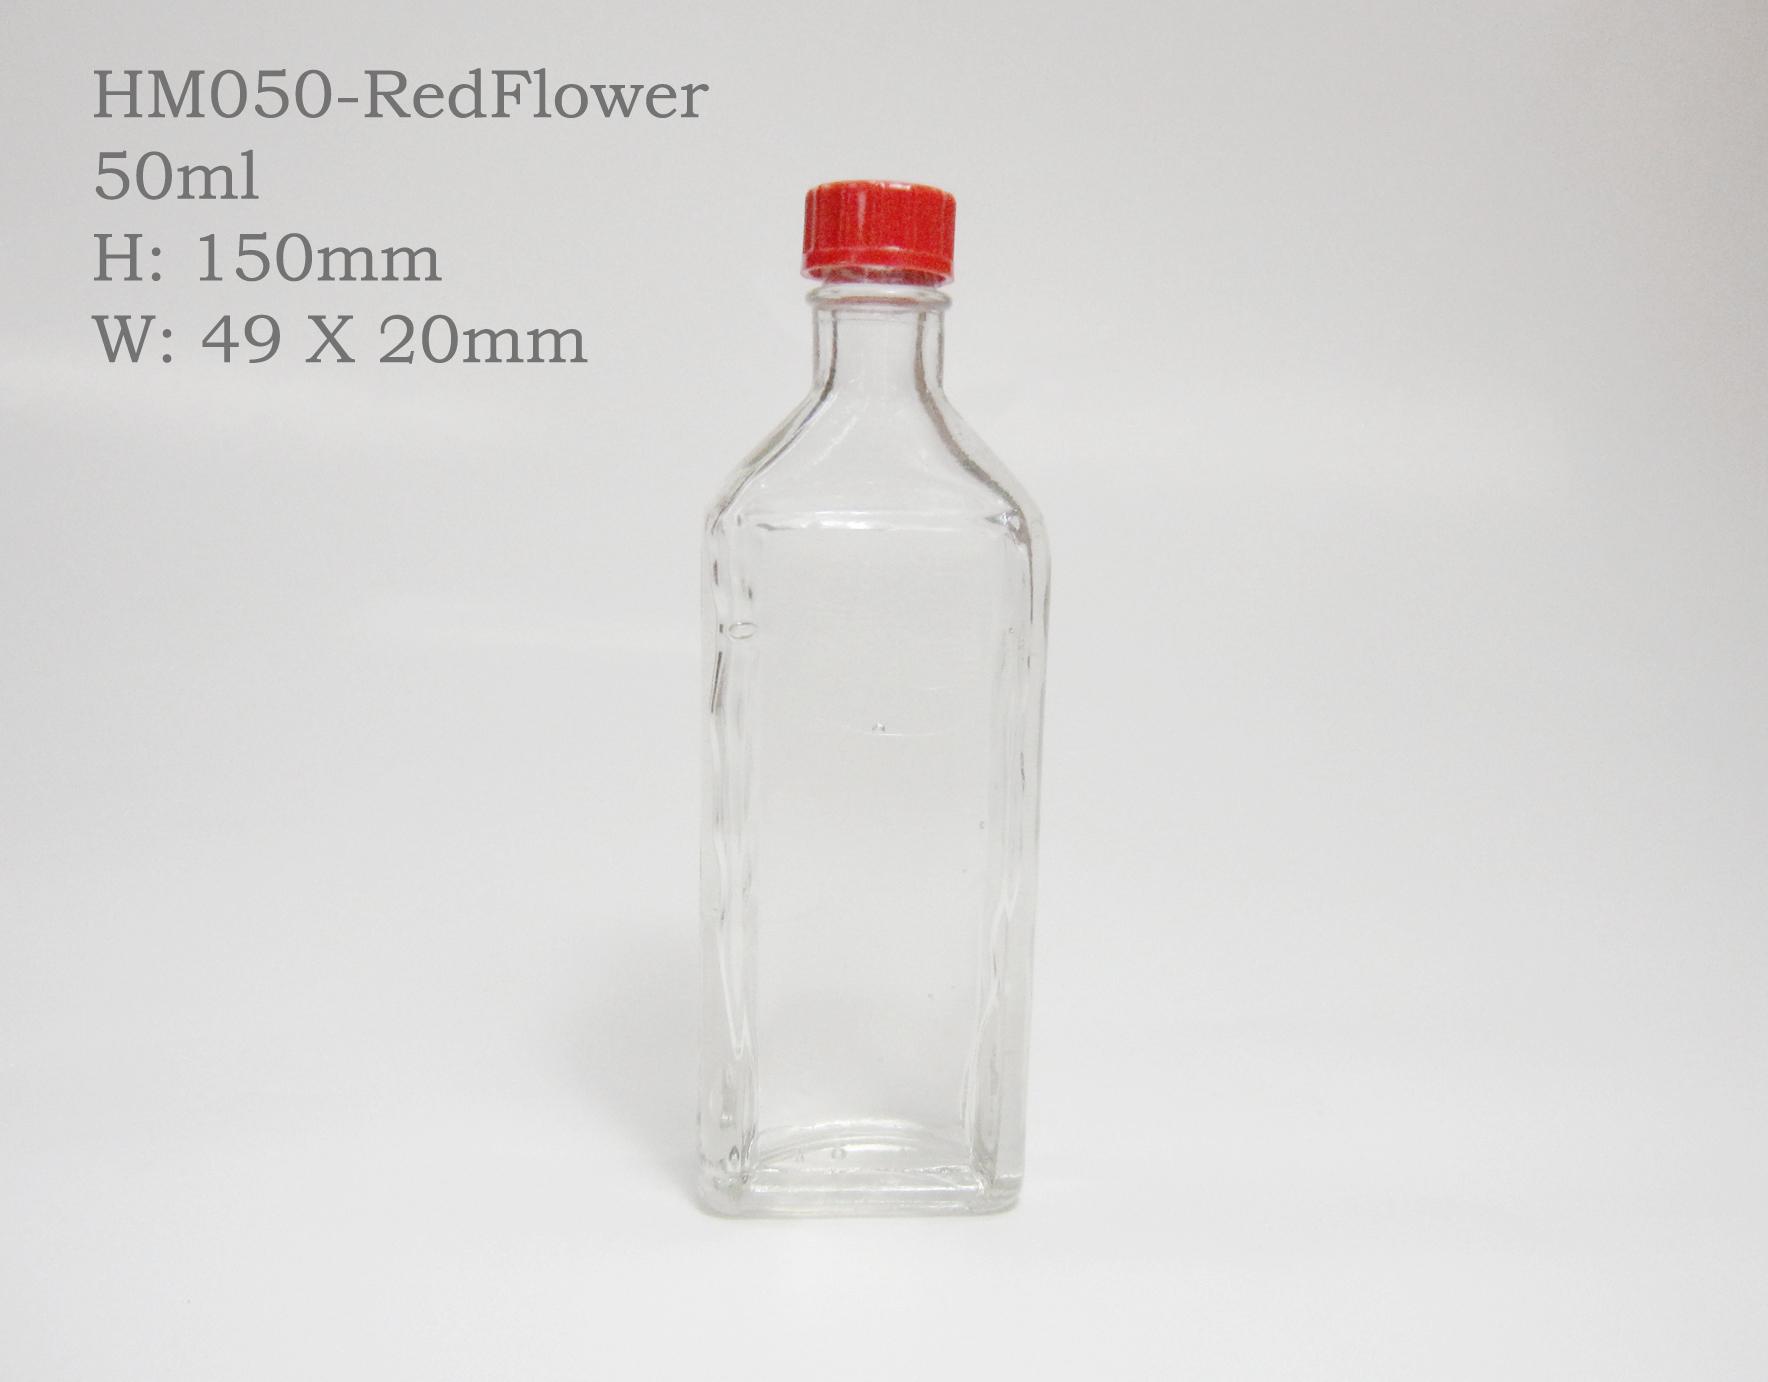 hm050redflower